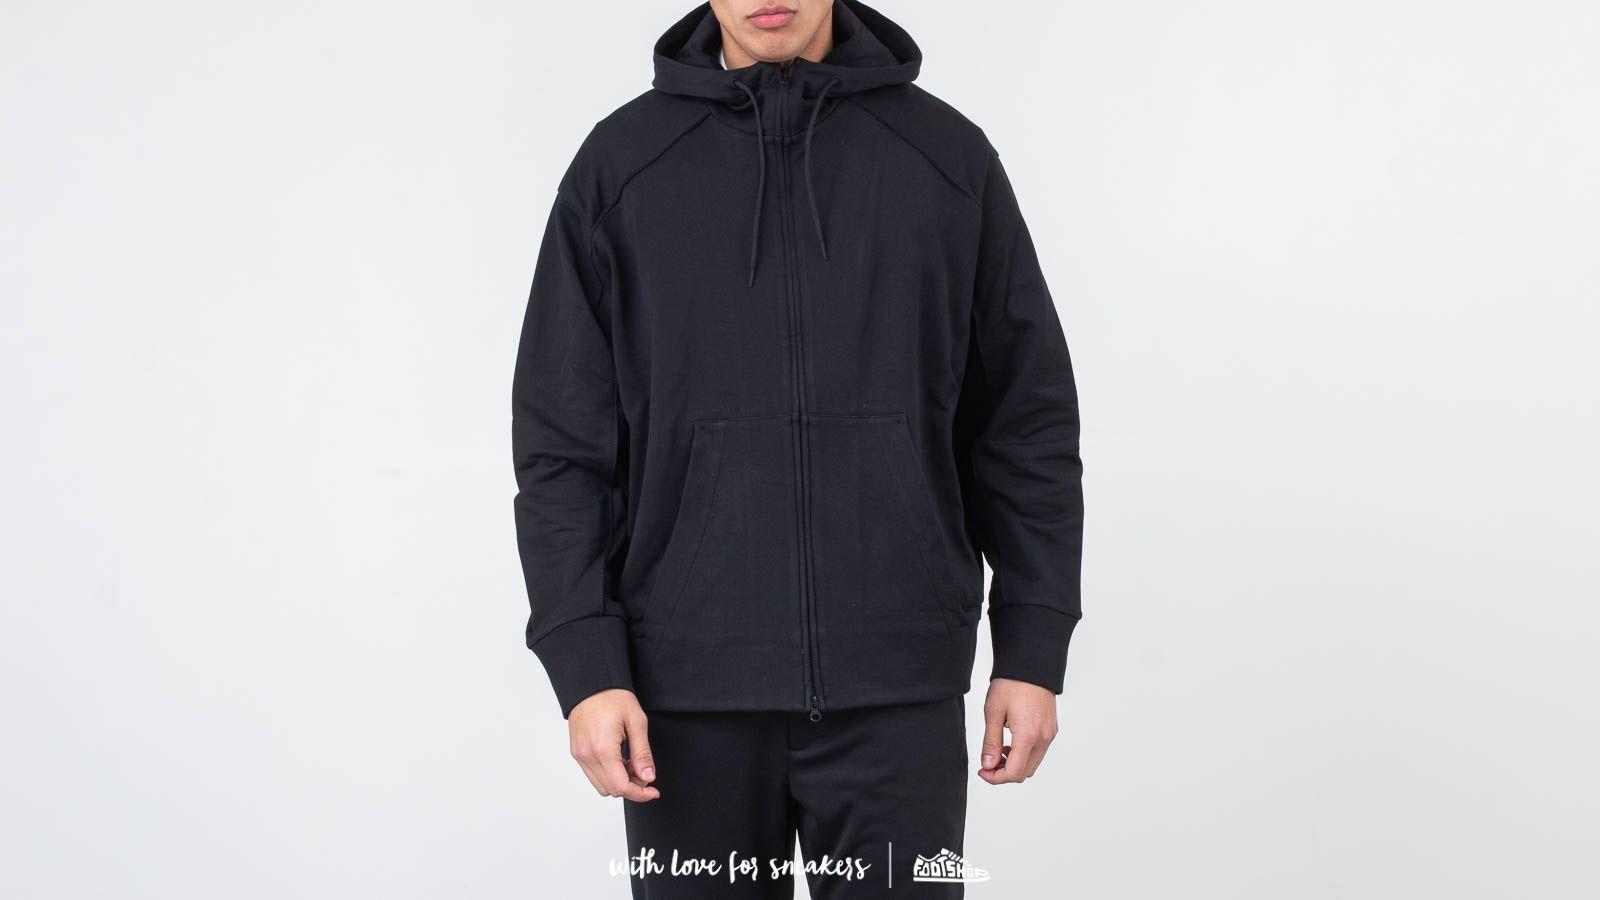 Y-3 Signature Graphic Hoodie Black za skvělou cenu 7 490 Kč koupíte na Footshop.cz